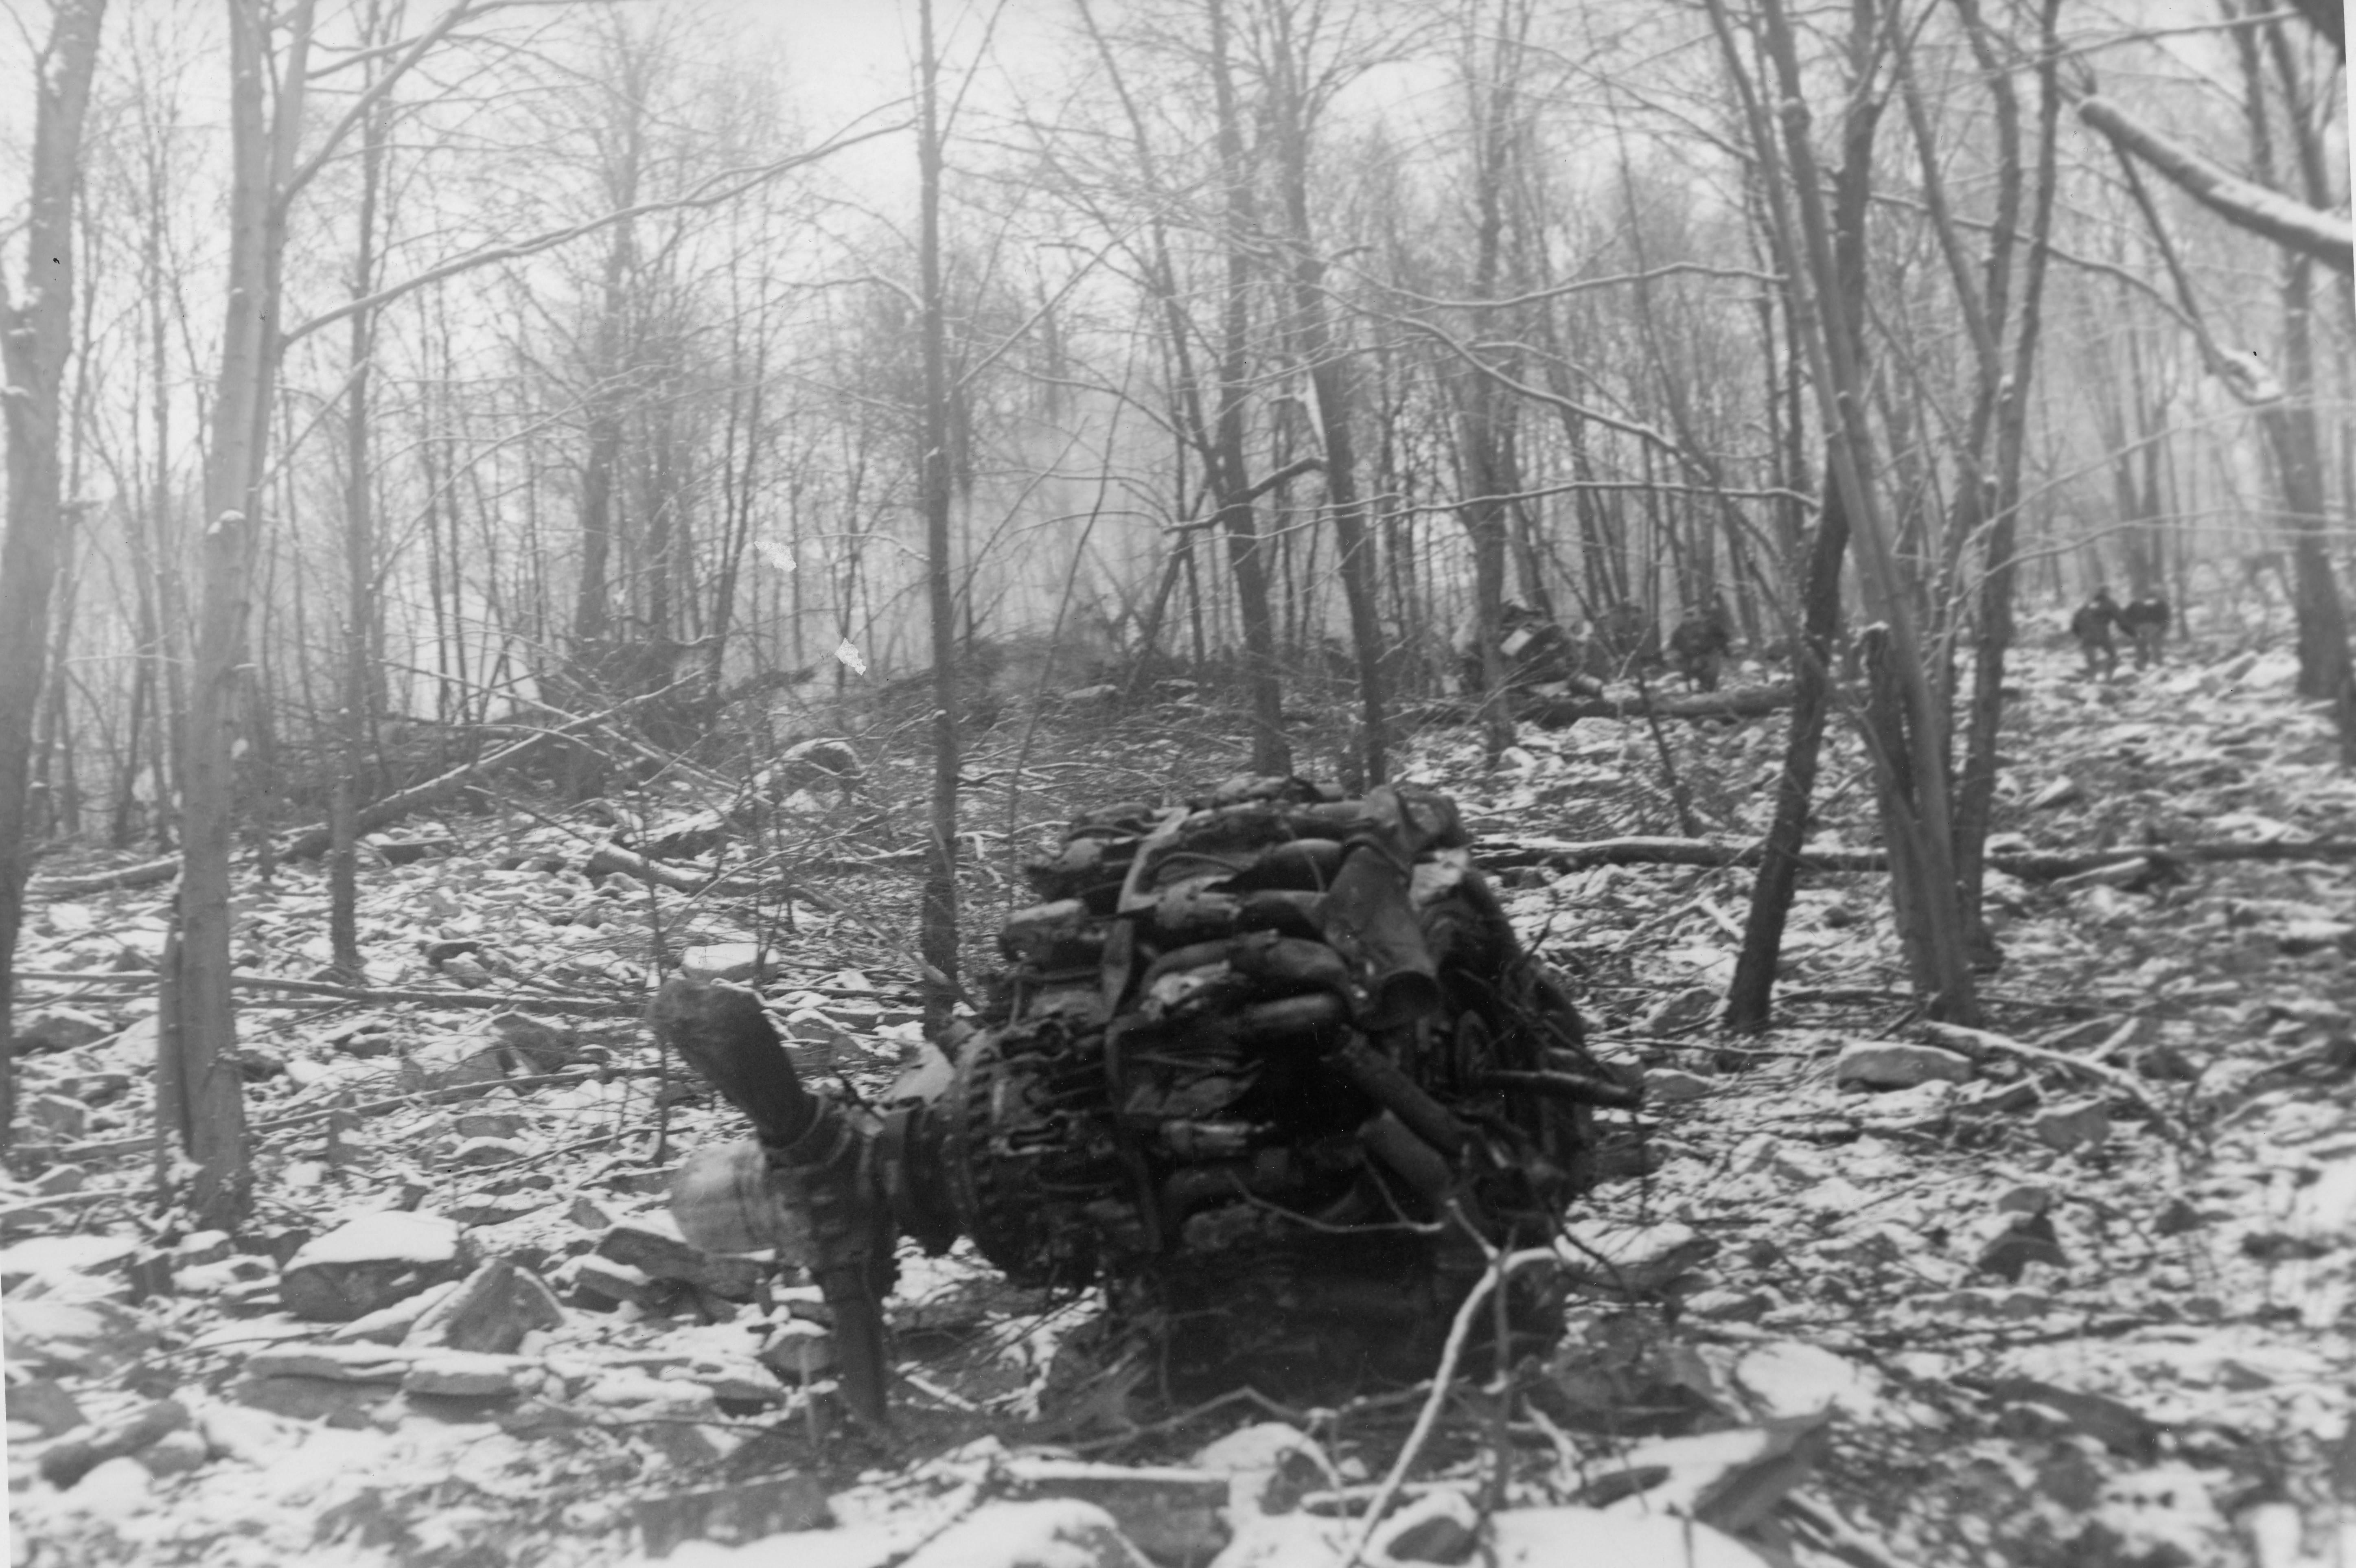 Engine laying below crash site. Photo courtesy of the Williamsport Sun Gazette archive.